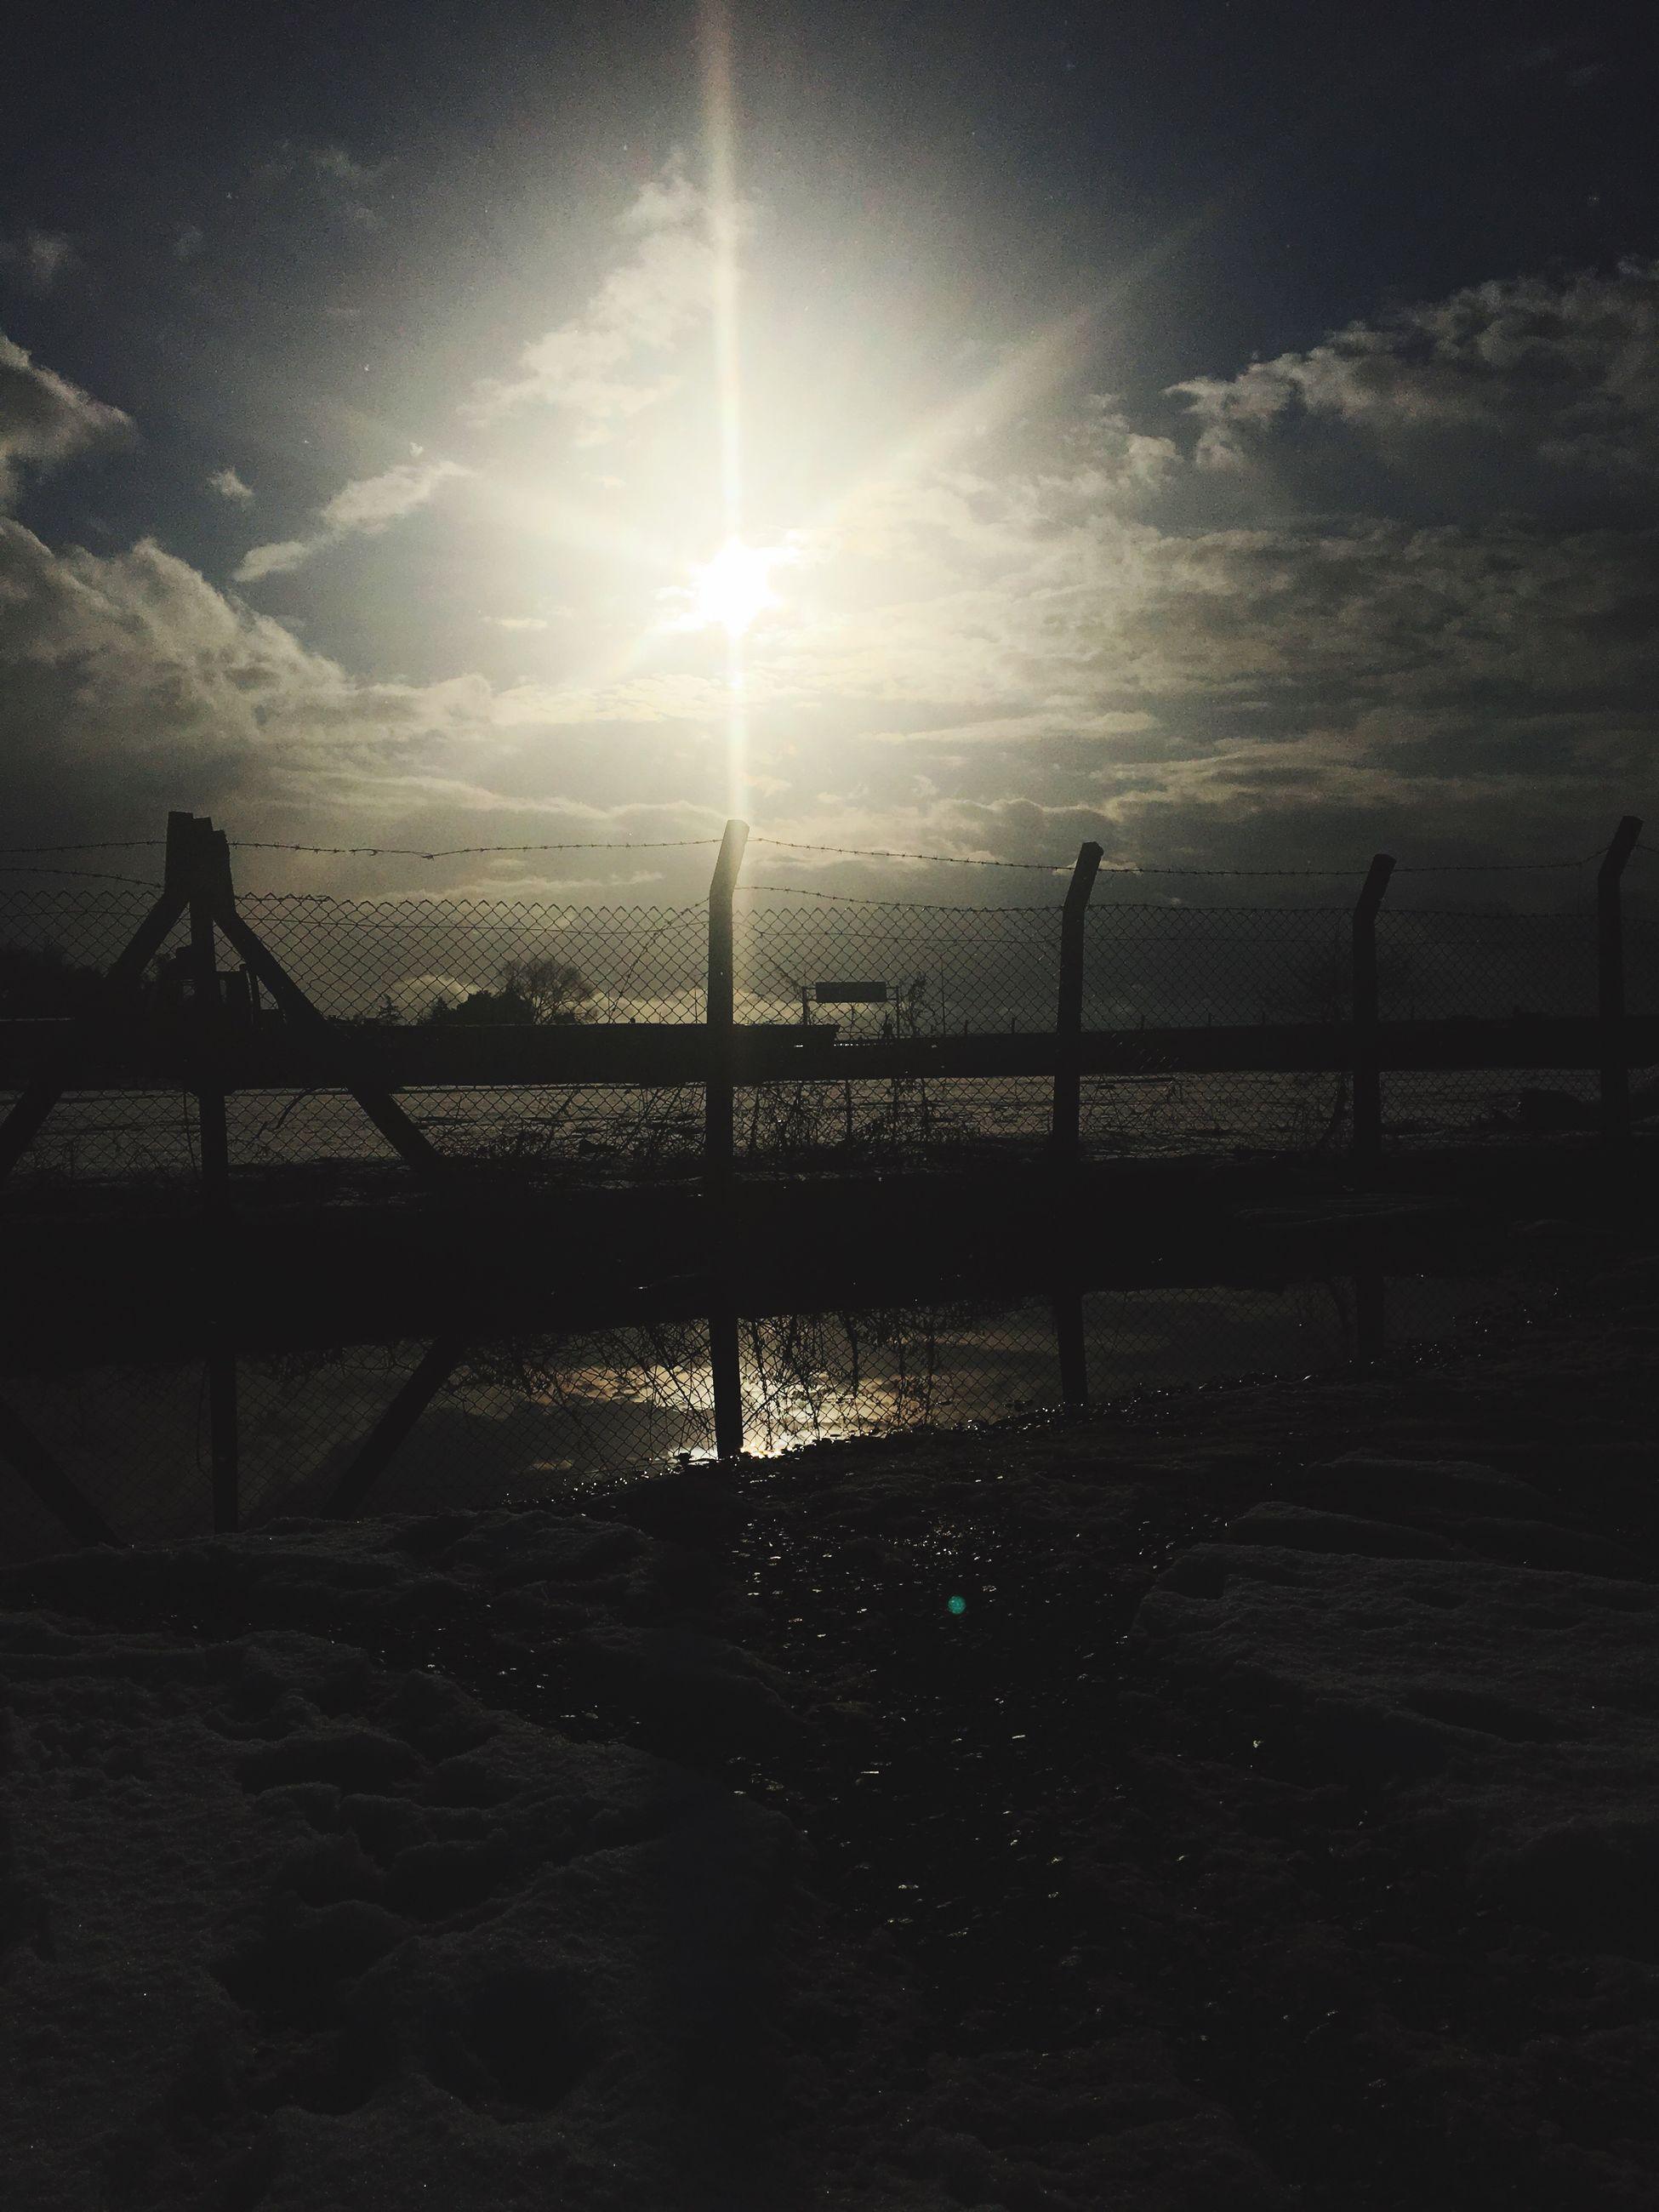 sky, sunlight, sun, sunset, nature, sunbeam, silhouette, sea, water, outdoors, no people, beauty in nature, bridge - man made structure, scenics, day